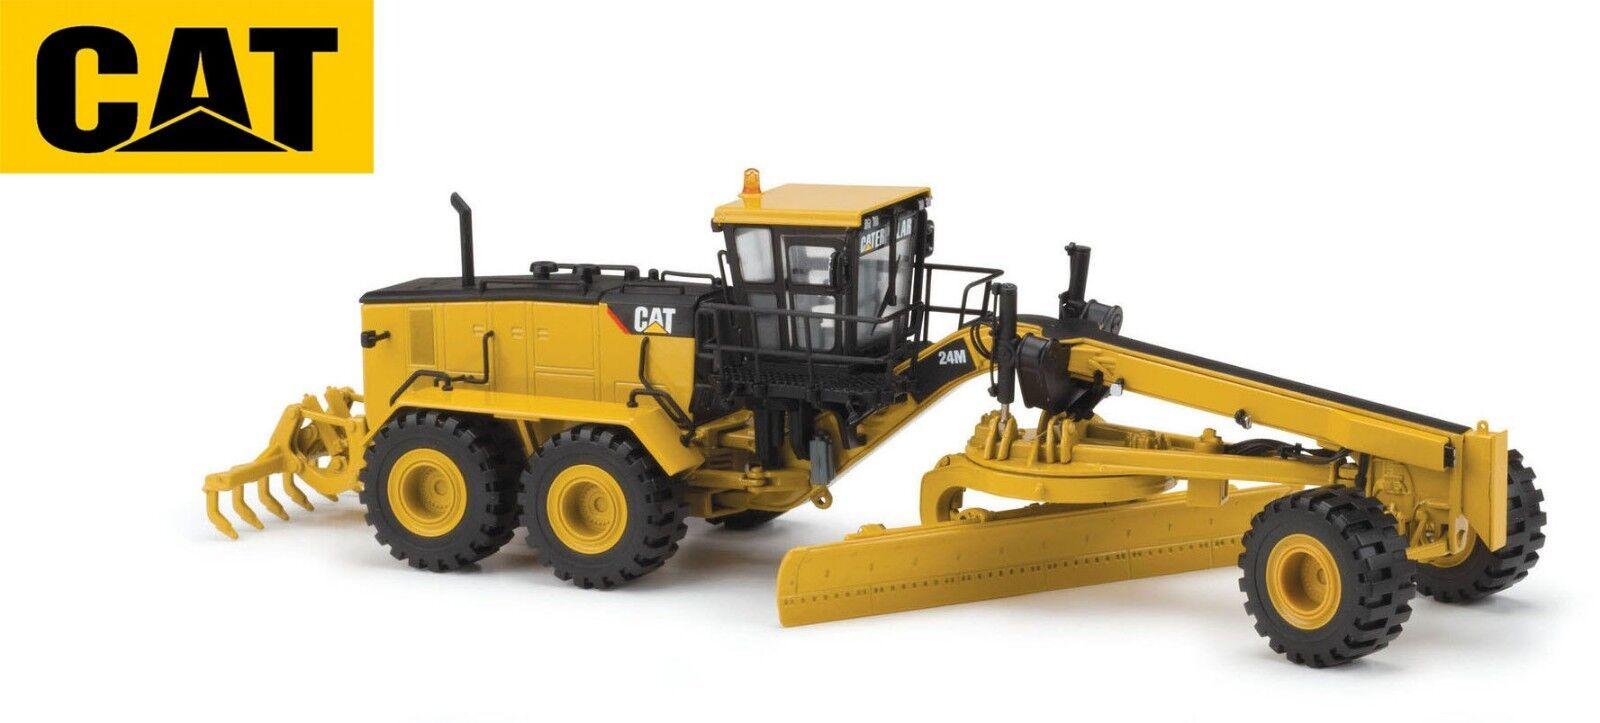 Norscot 55264 Cat Caterpillar 24M Motor Grader Diecast 1 50 scale Toy